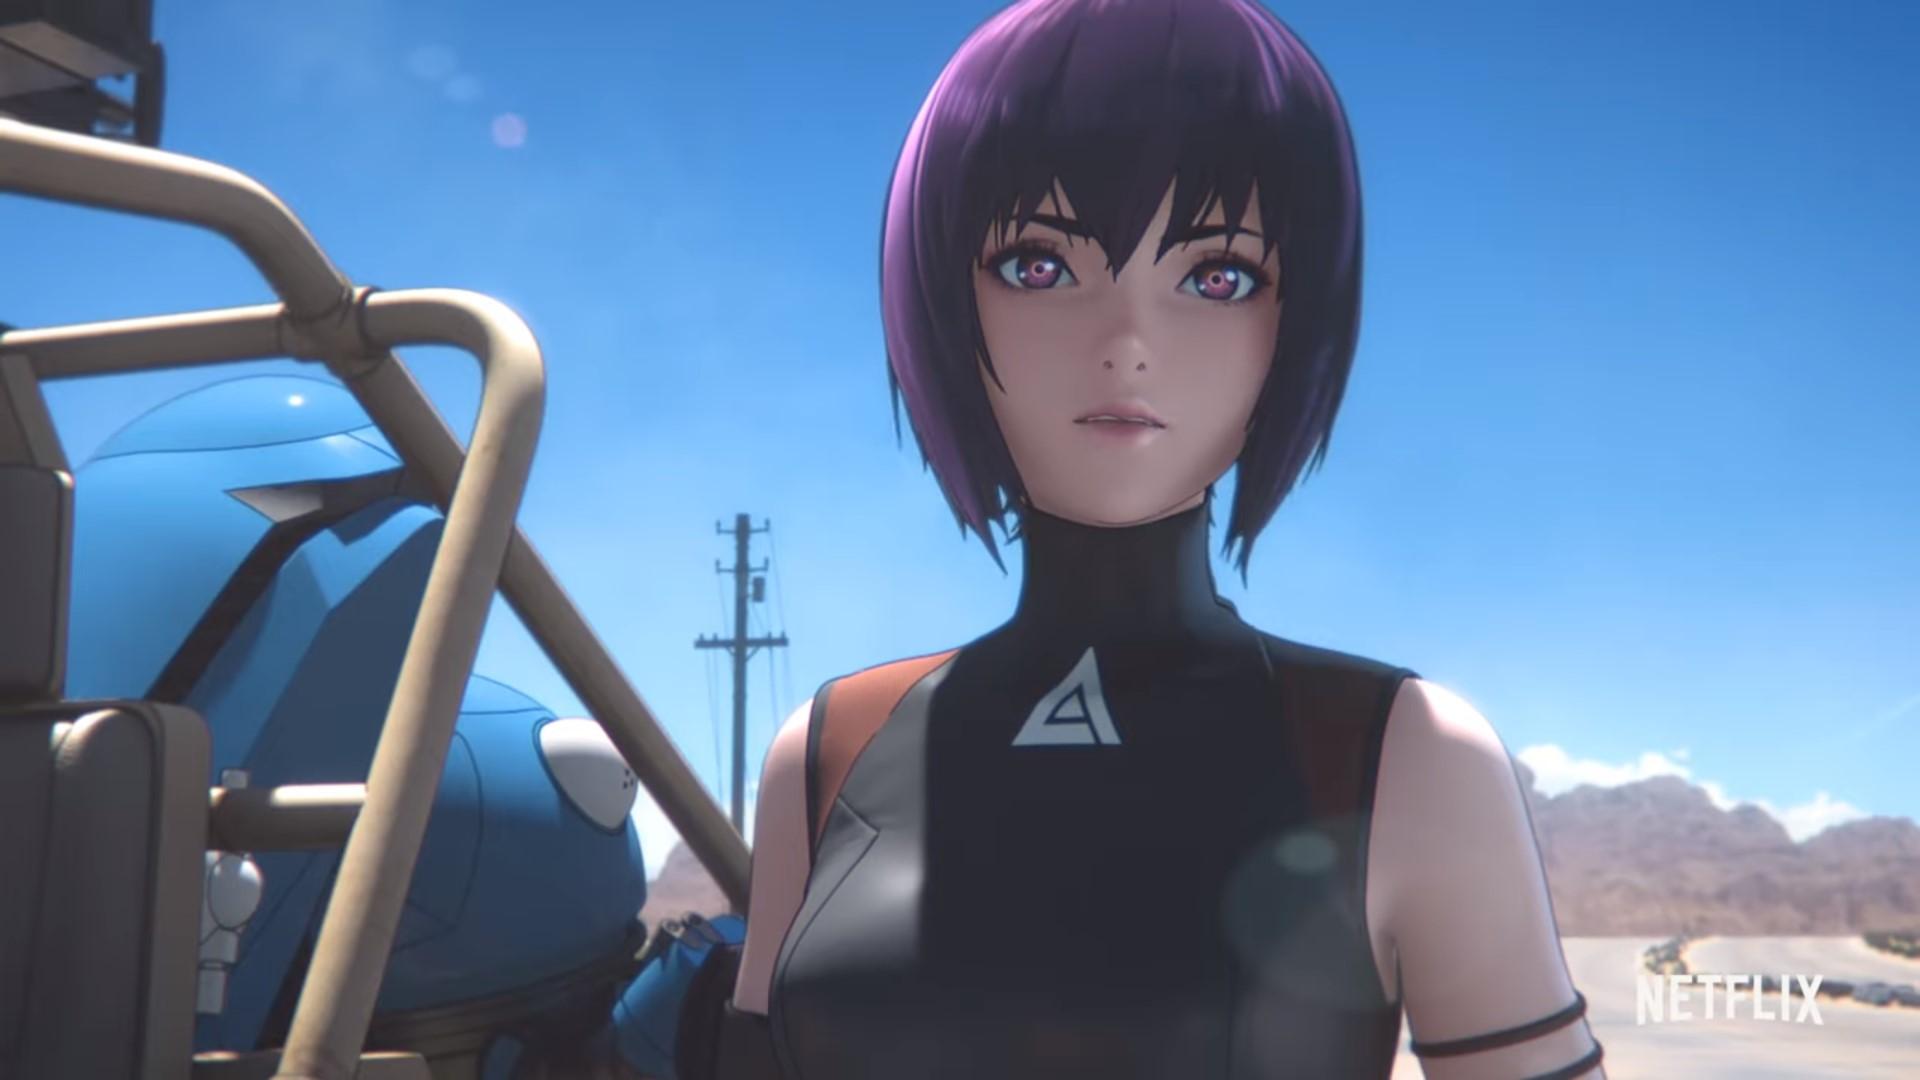 Mili interpretará el ending del anime Ghost in the Shell: SAC_2045